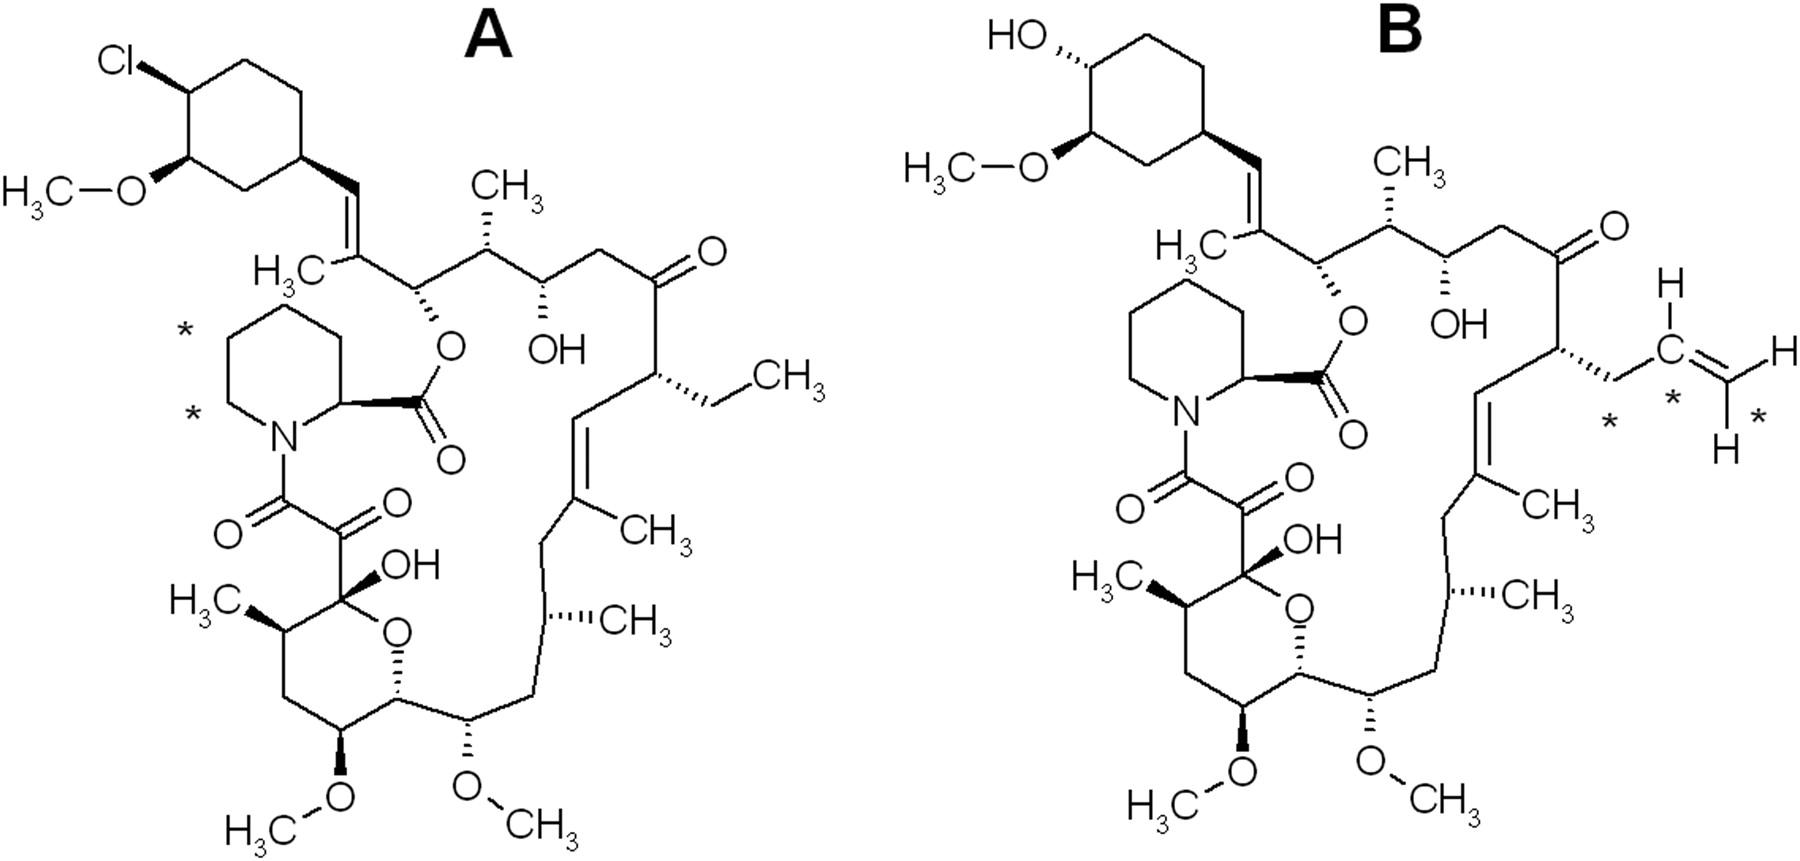 Binding of Pimecrolimus and Tacrolimus to Skin and Plasma